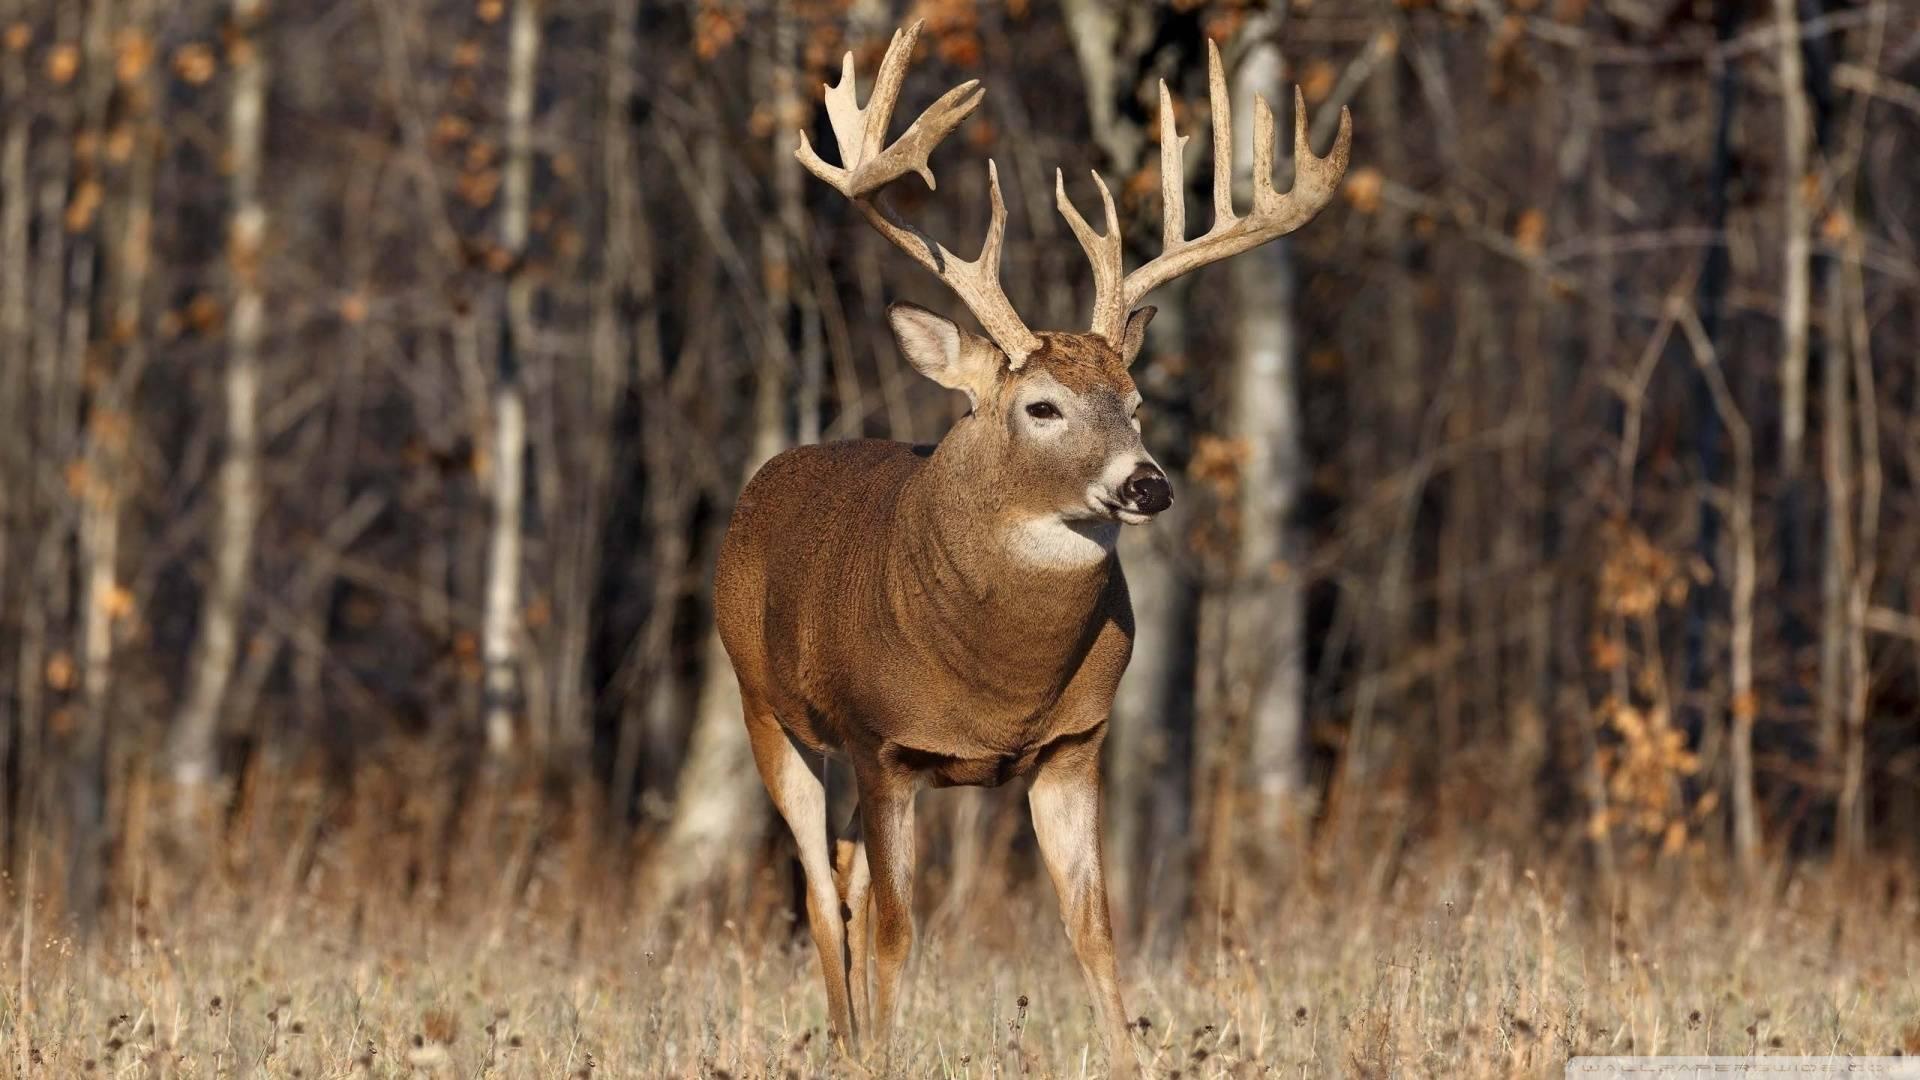 1920x1080 577005 kb brave big deer source keys picture pictures 1920x1080